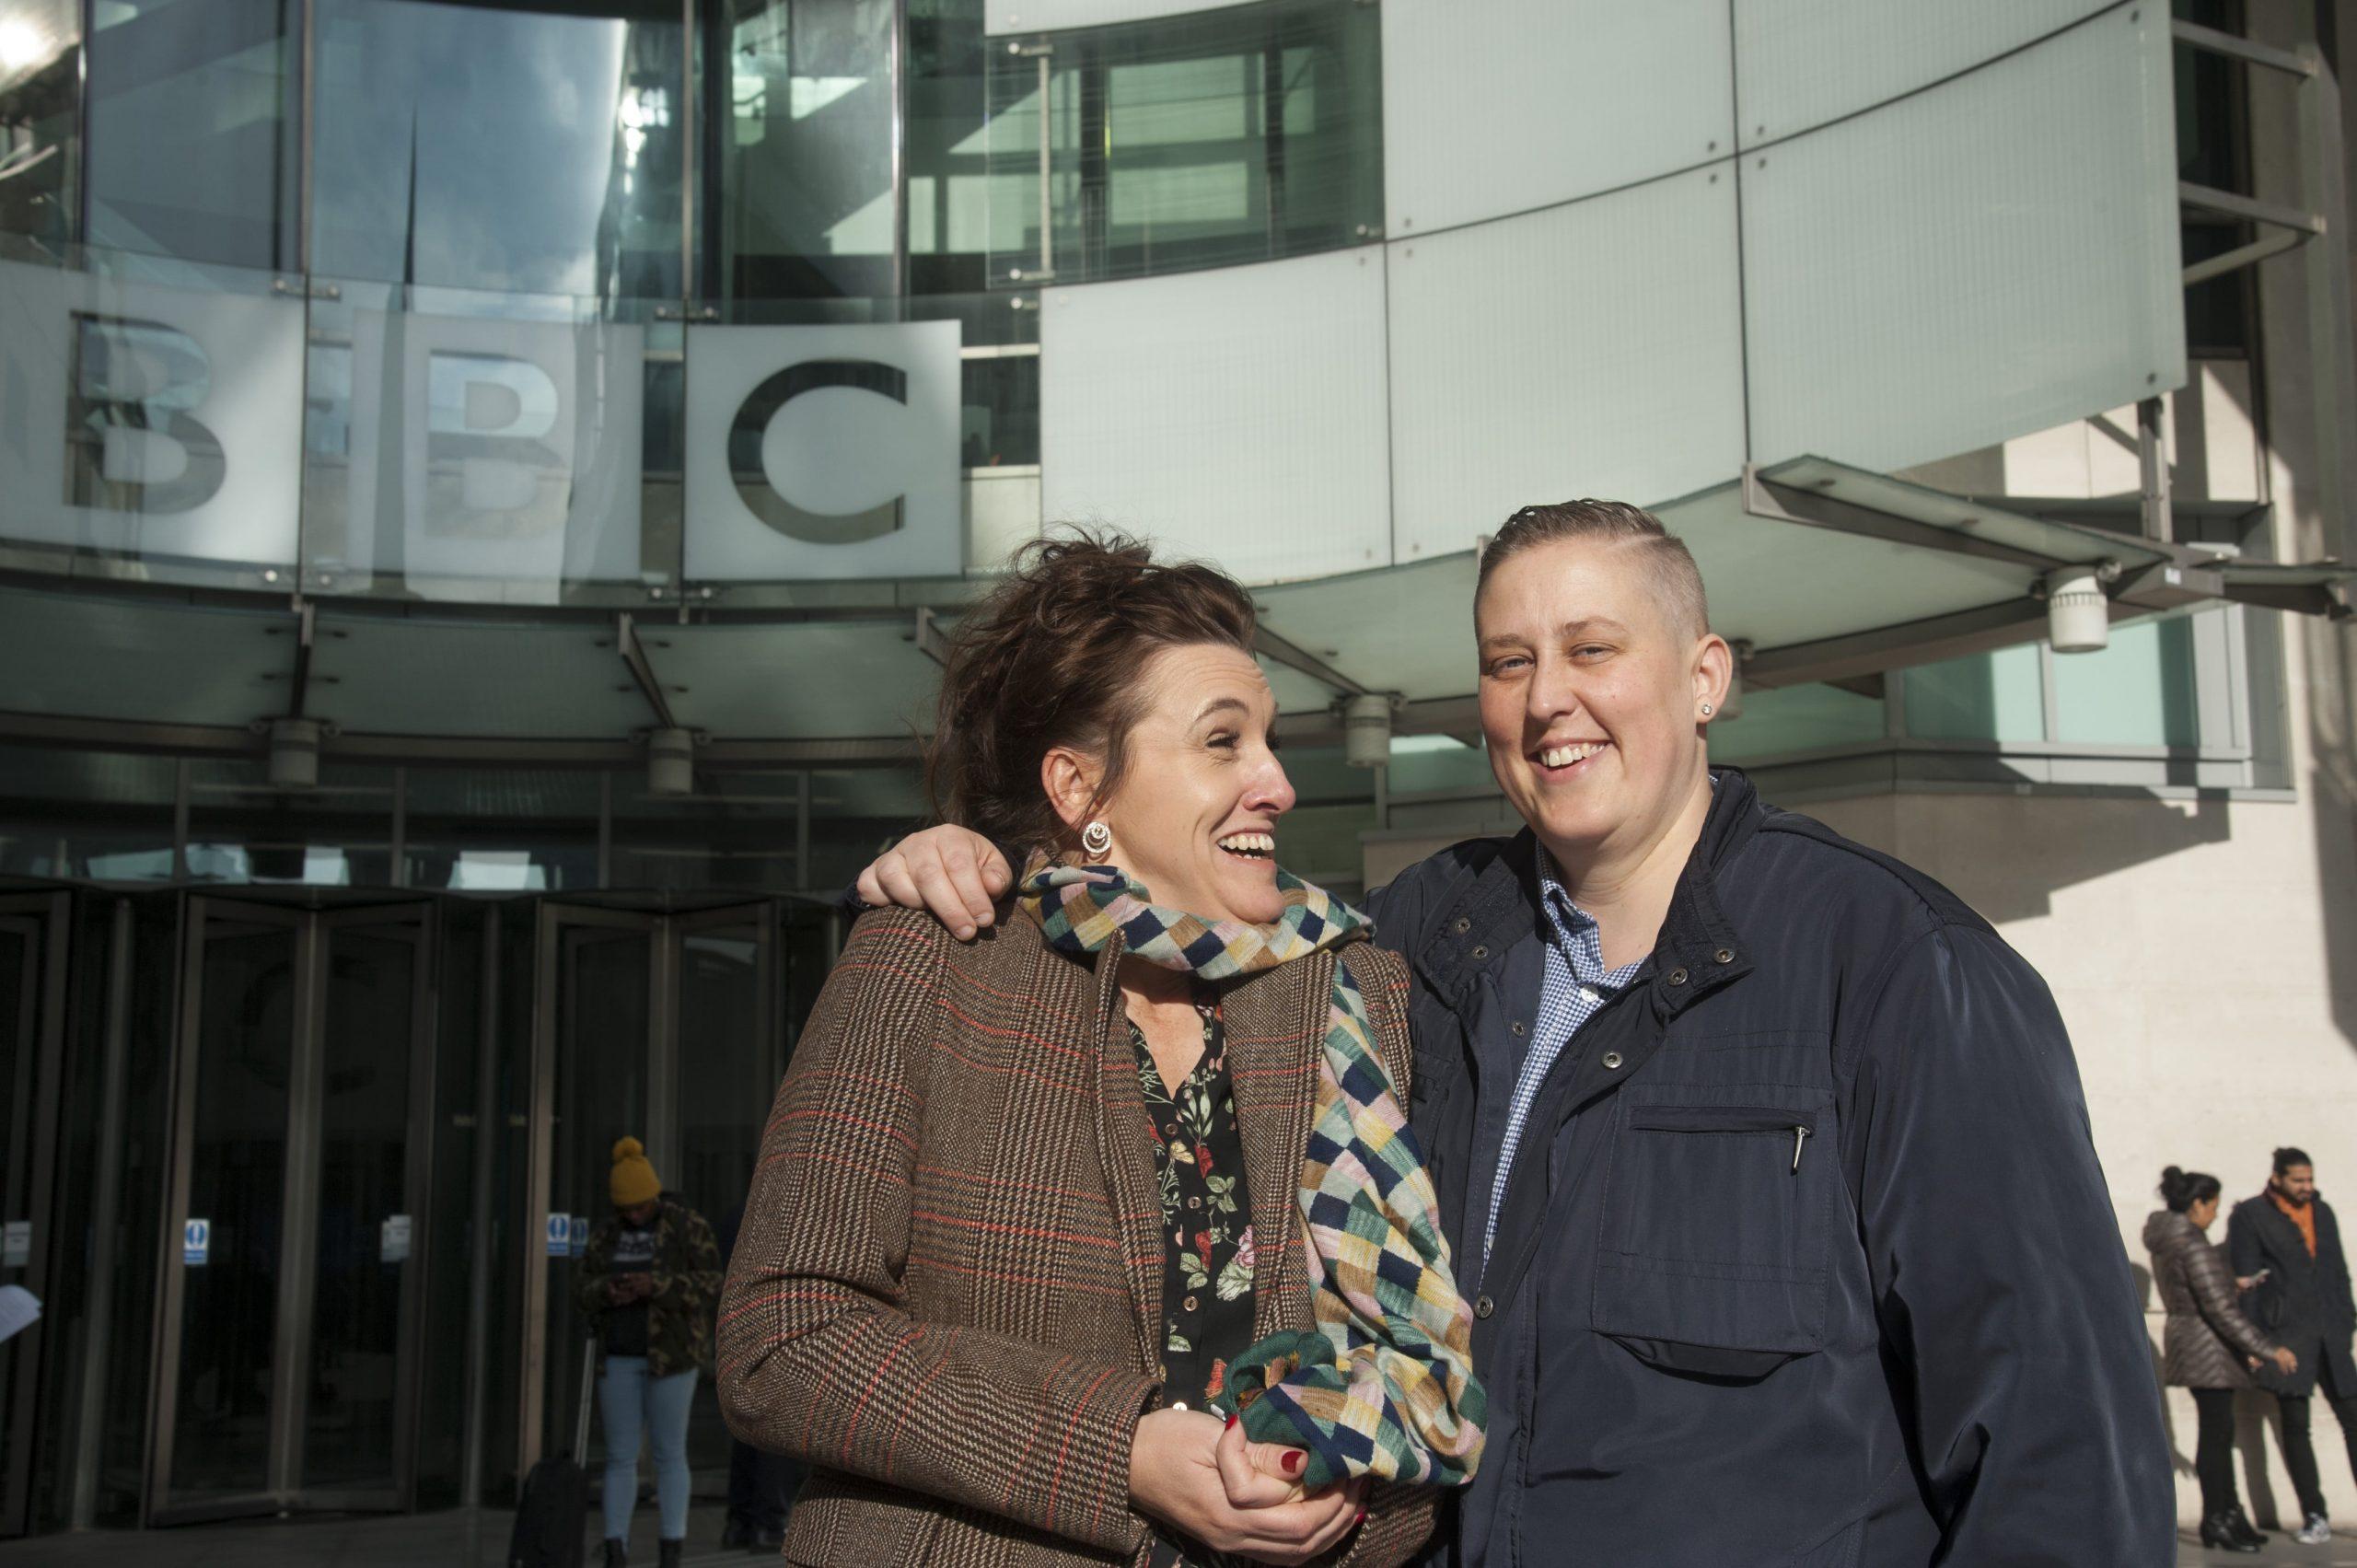 Grace and Dalton - BBC Radio 4 Appeal